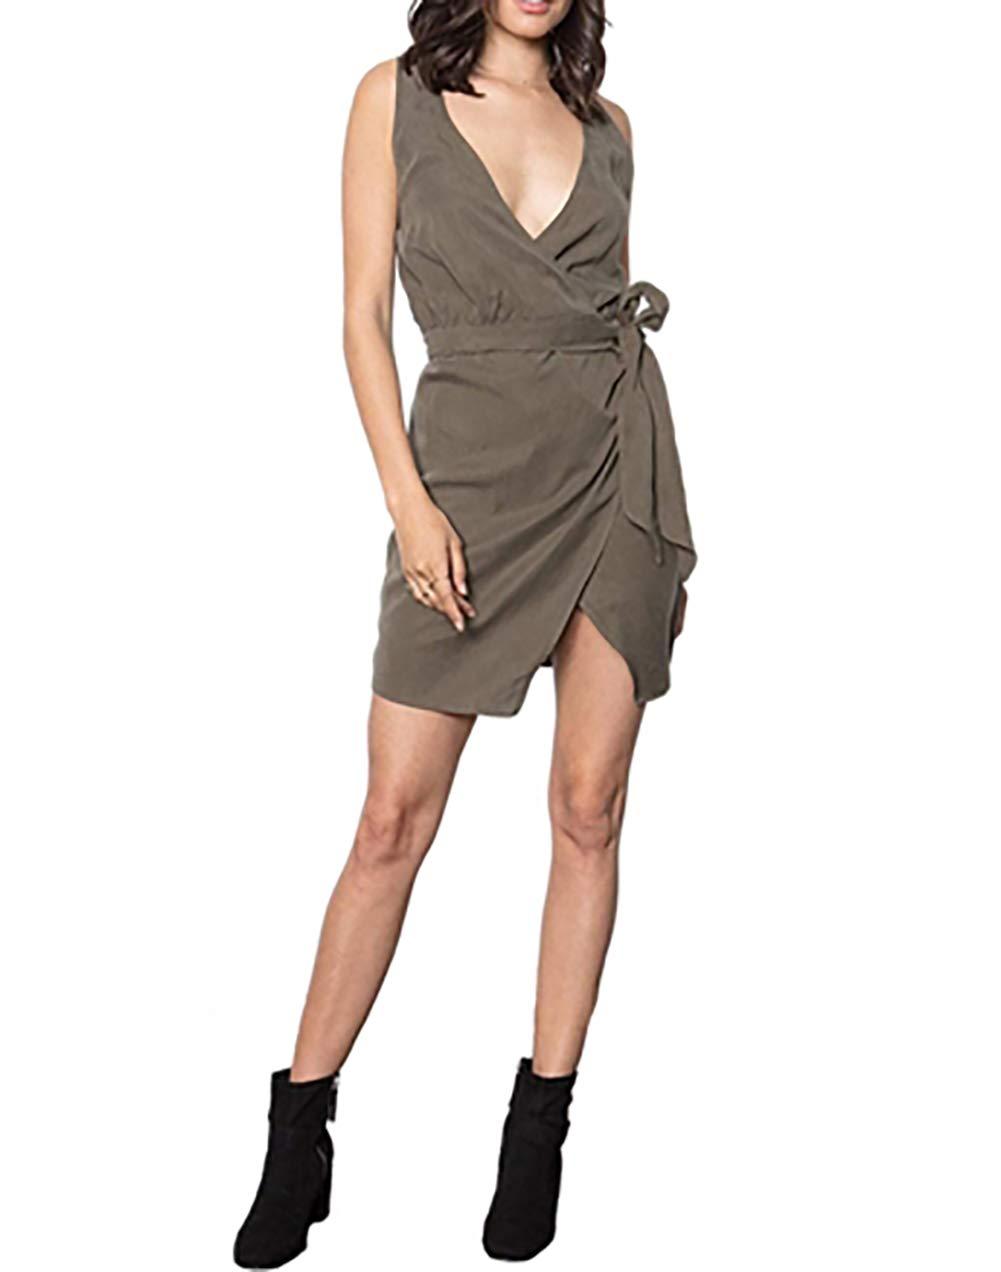 Stillwater The Knotty Wrap Dress in Olive (Medium)